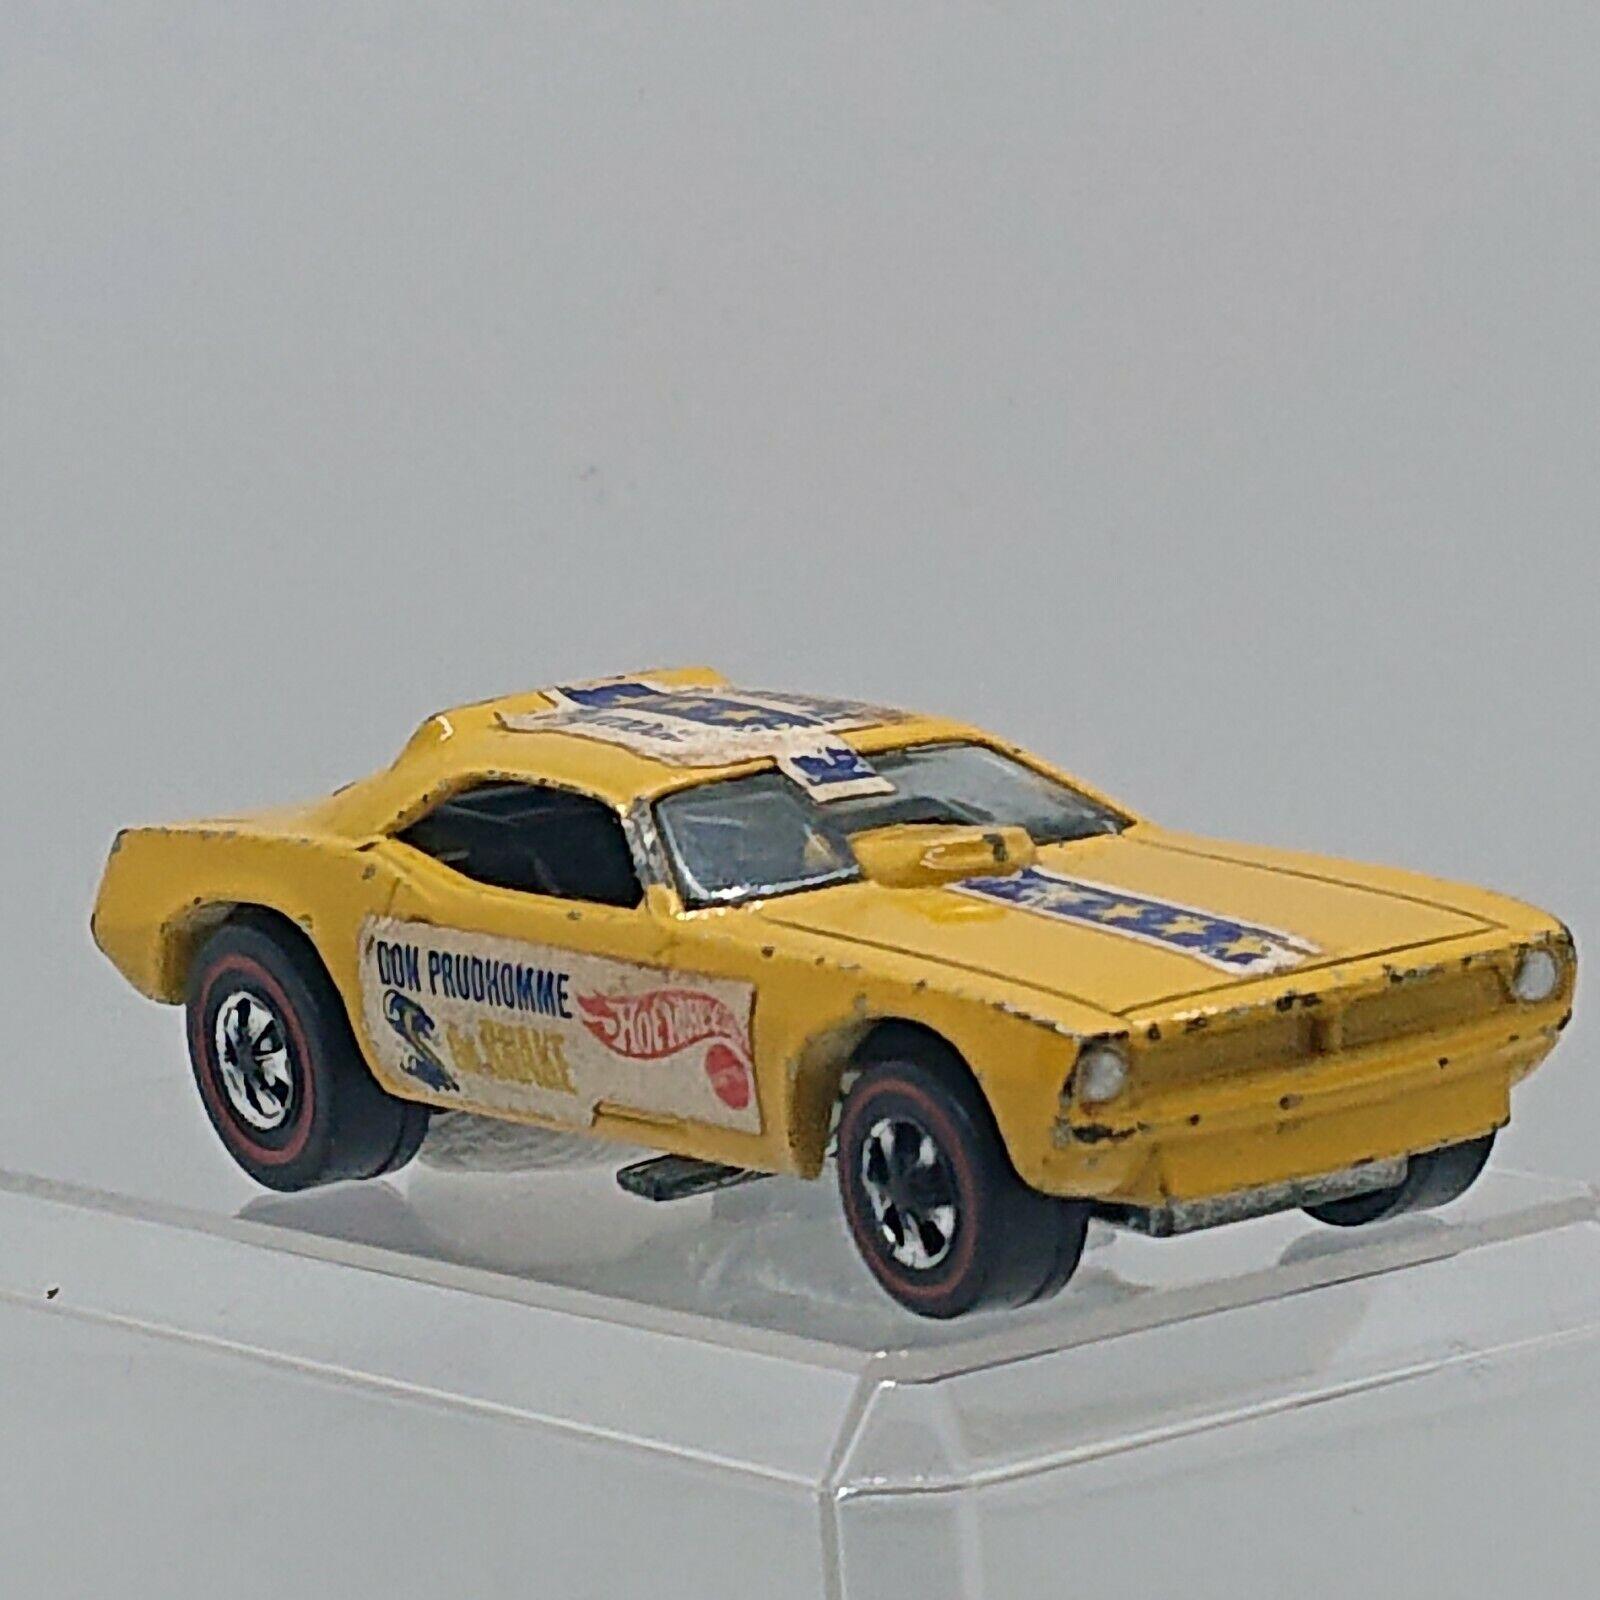 1970 Hot Wheels Serpiente giallo rossoline USA hw1166